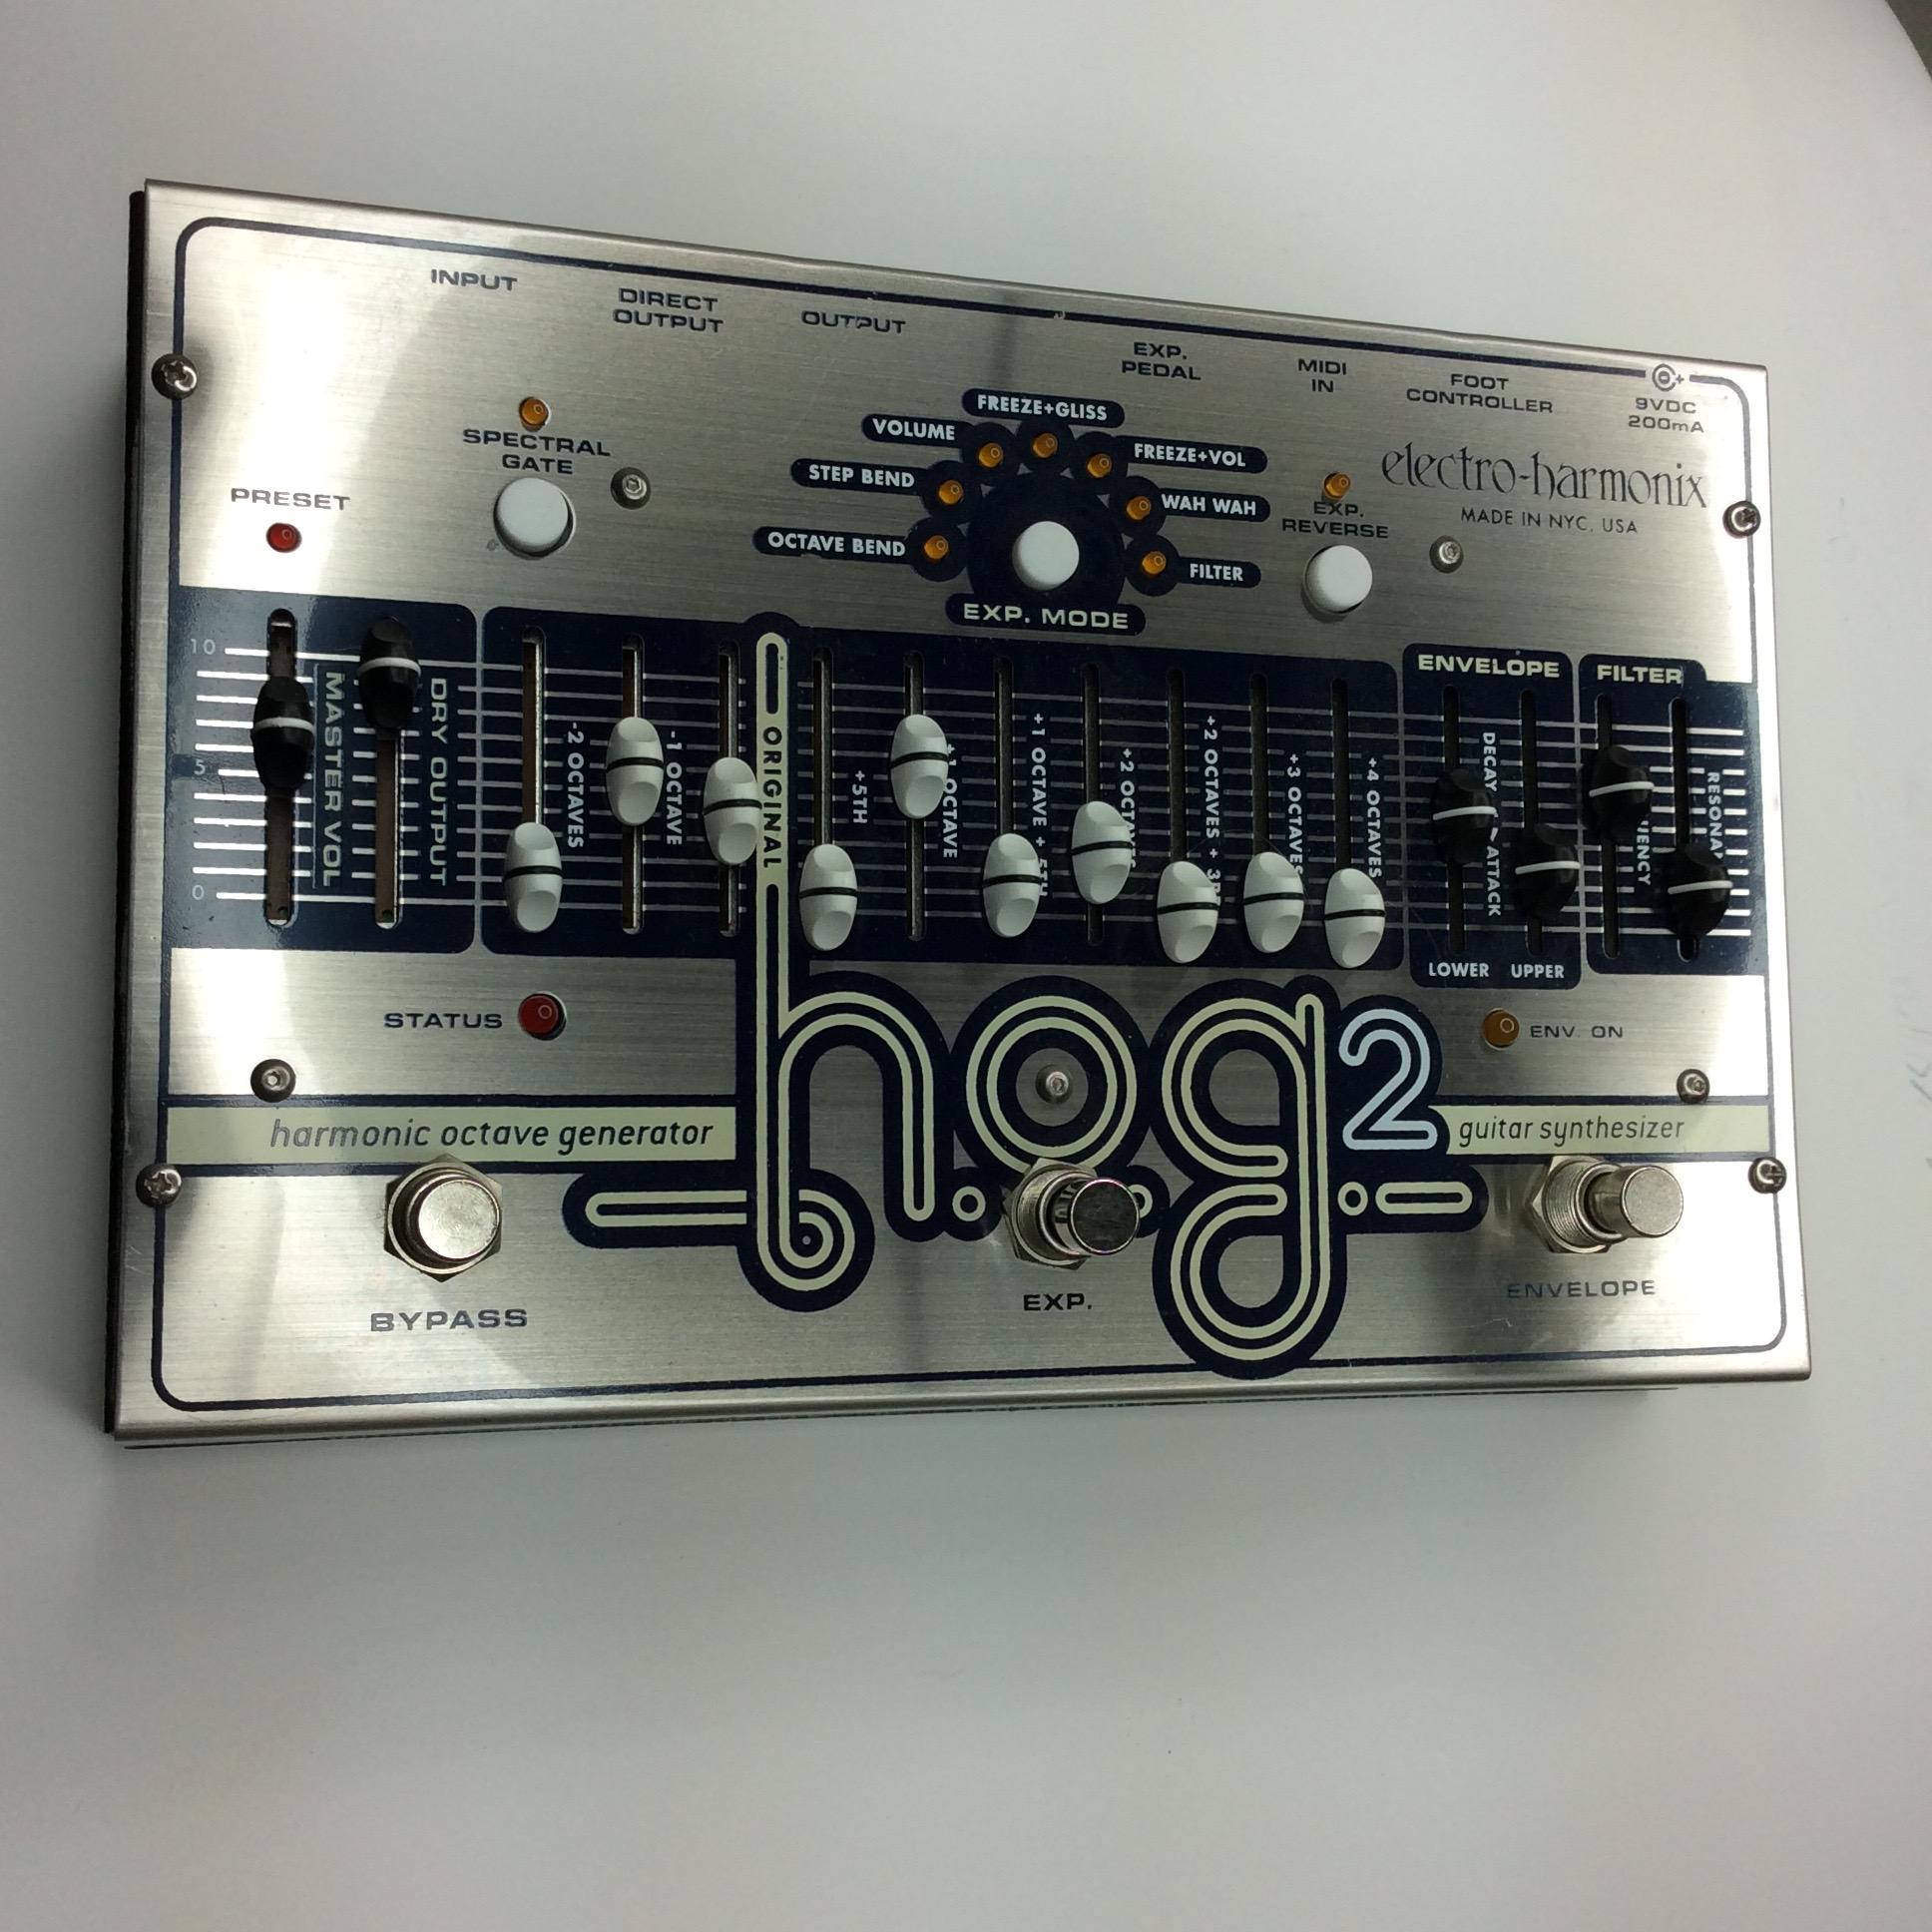 Harmonic Octave Generator 2  Make: electro-harmonix